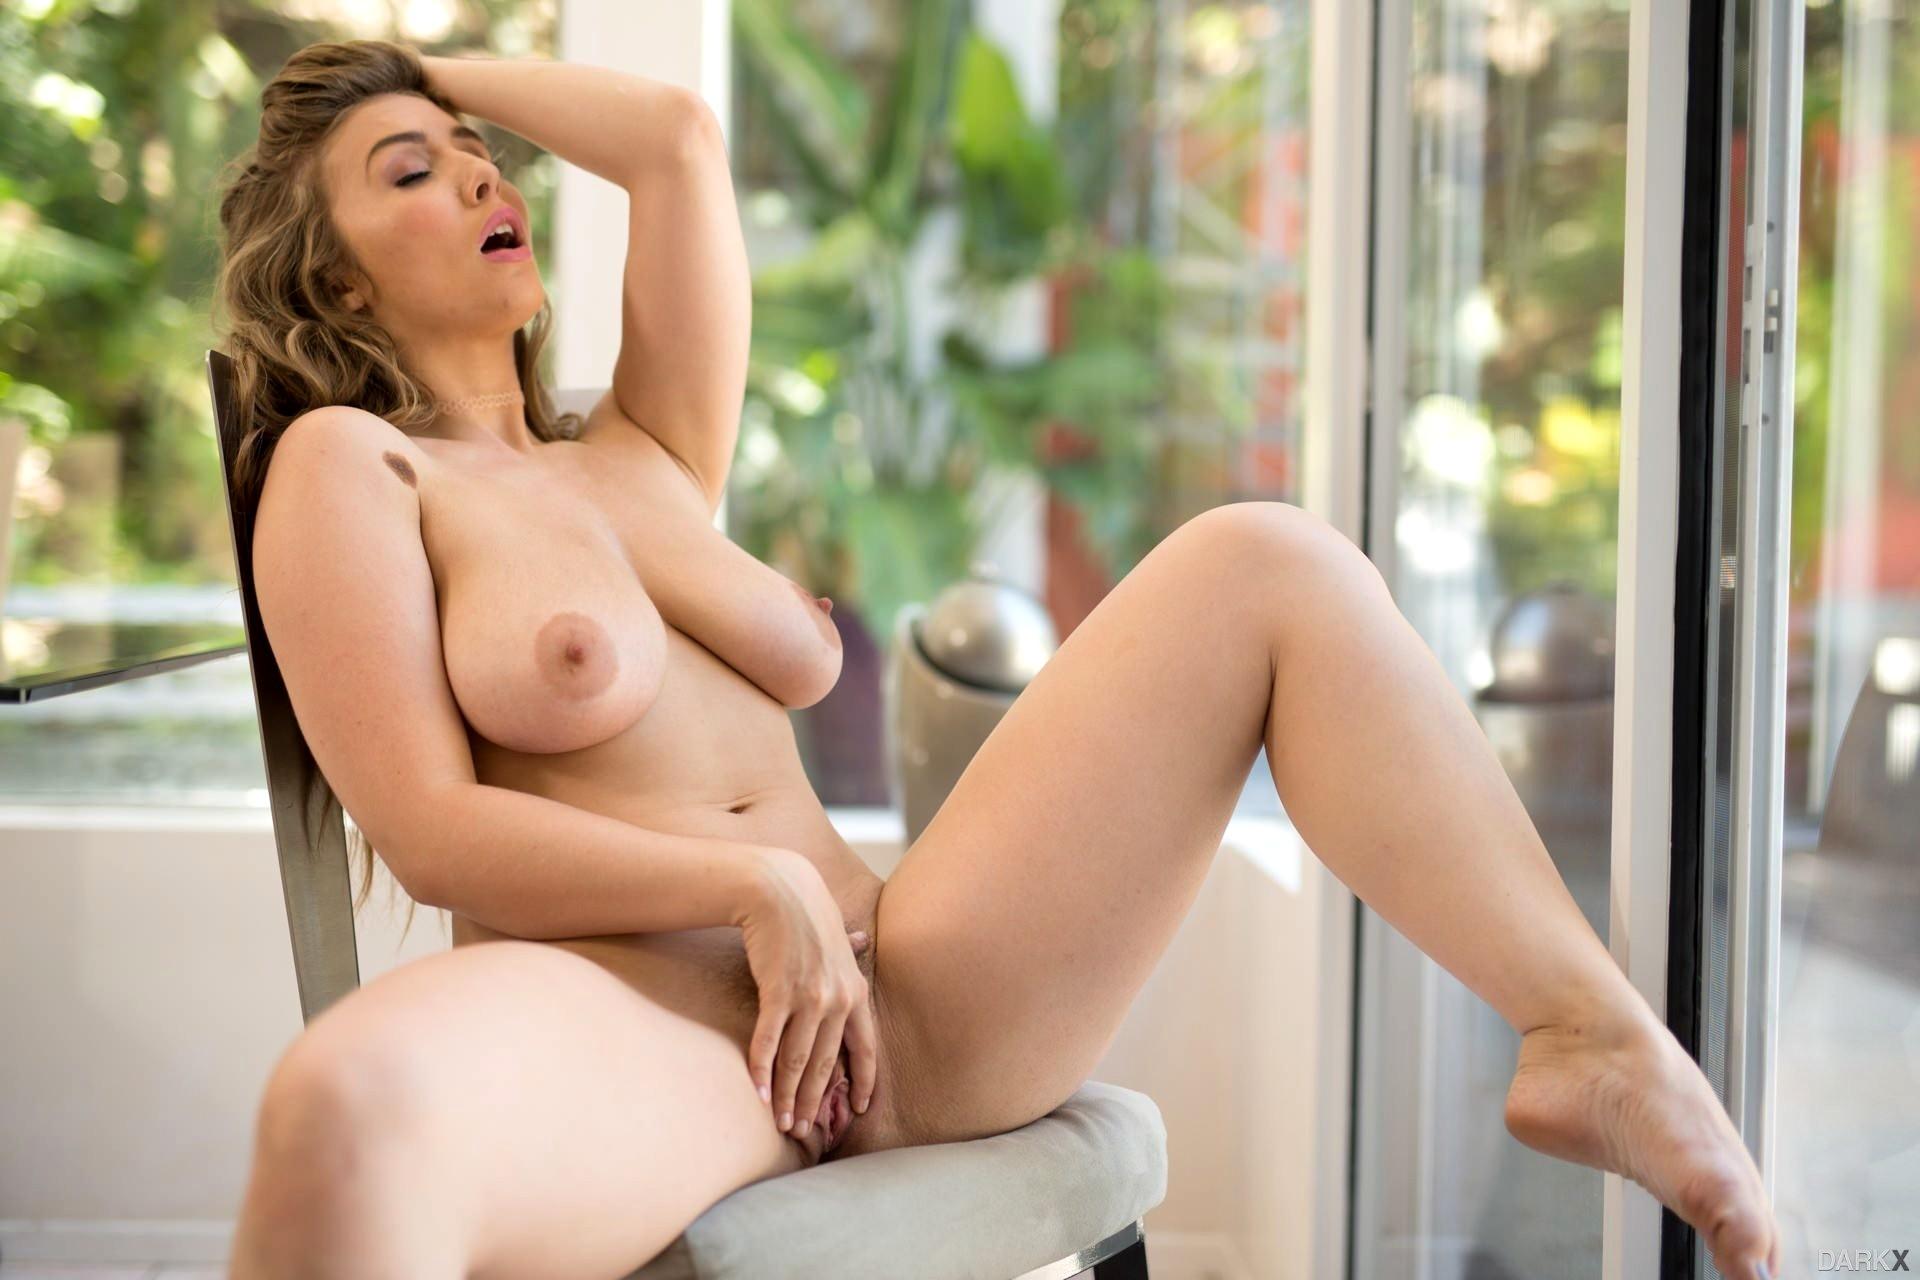 sex hd mobile pics xempire lena paul she big tits nude ass